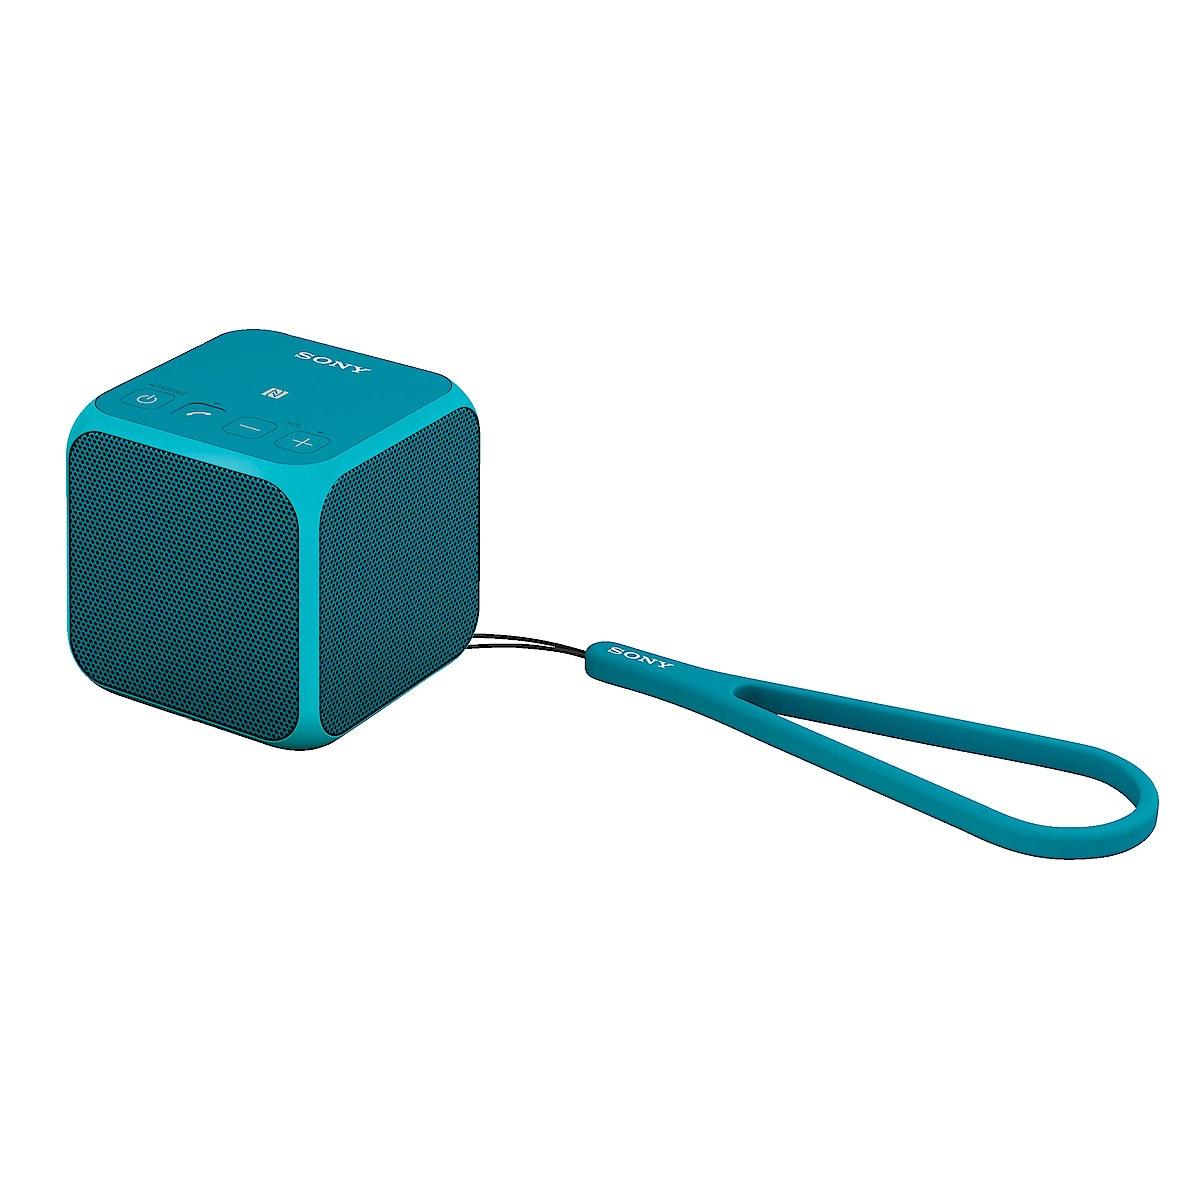 SRS-X11 Sony Bluetooth Speaker